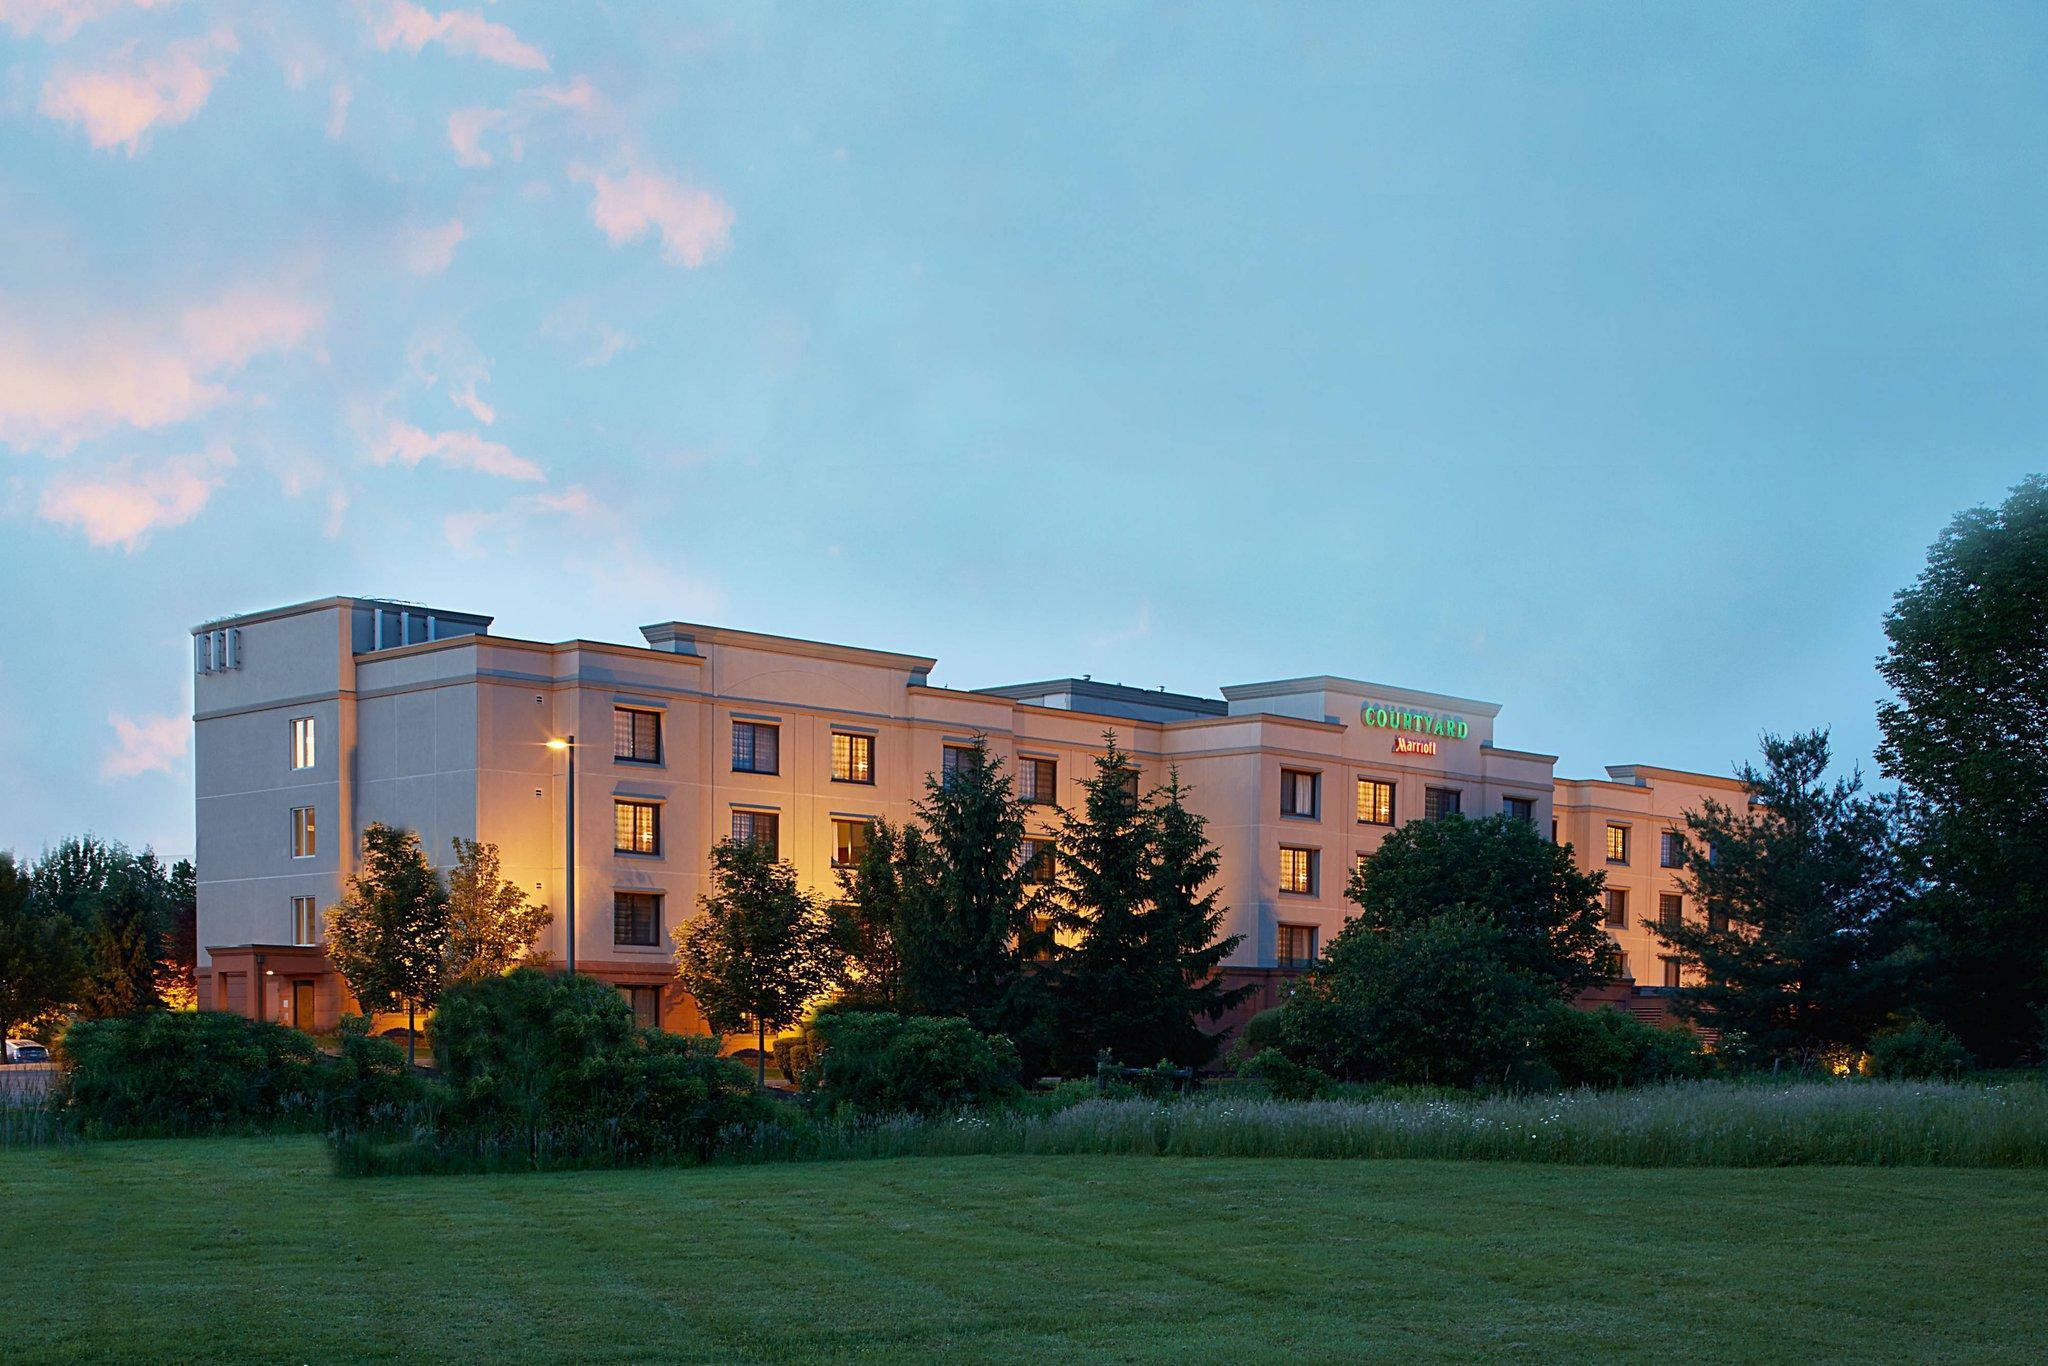 Courtyard Ithaca Airport University